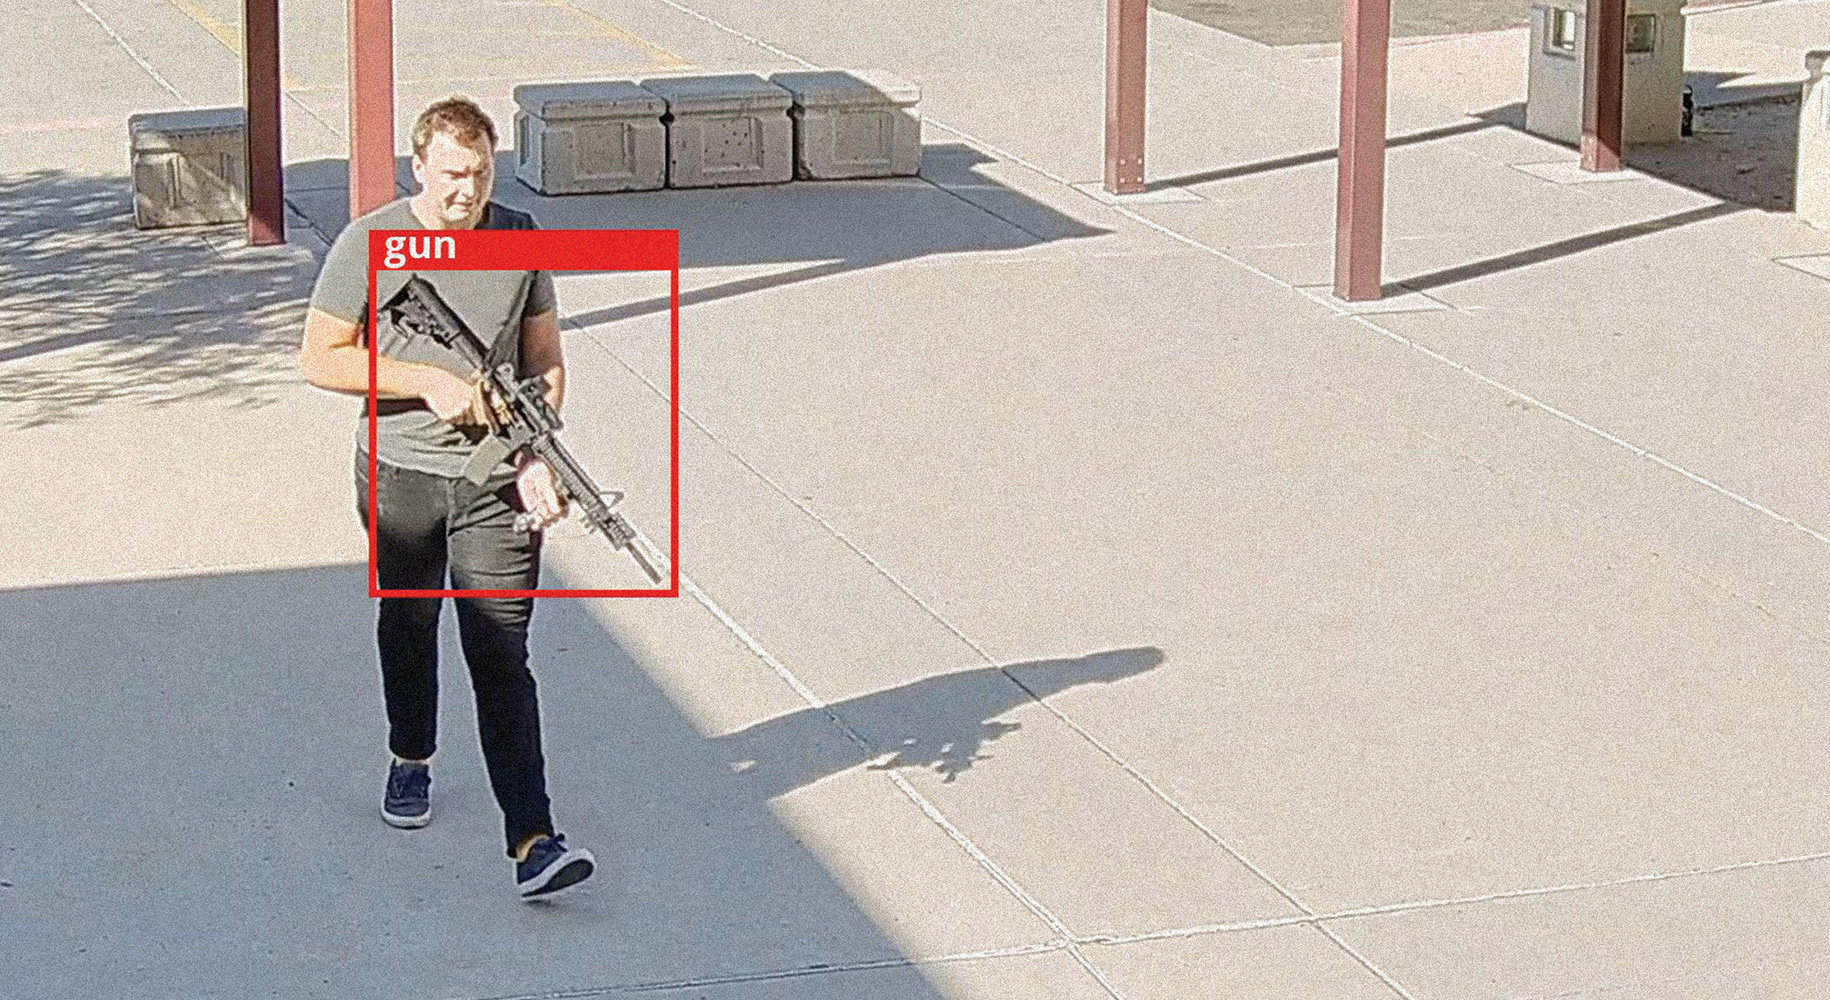 24/7 AI gun detection